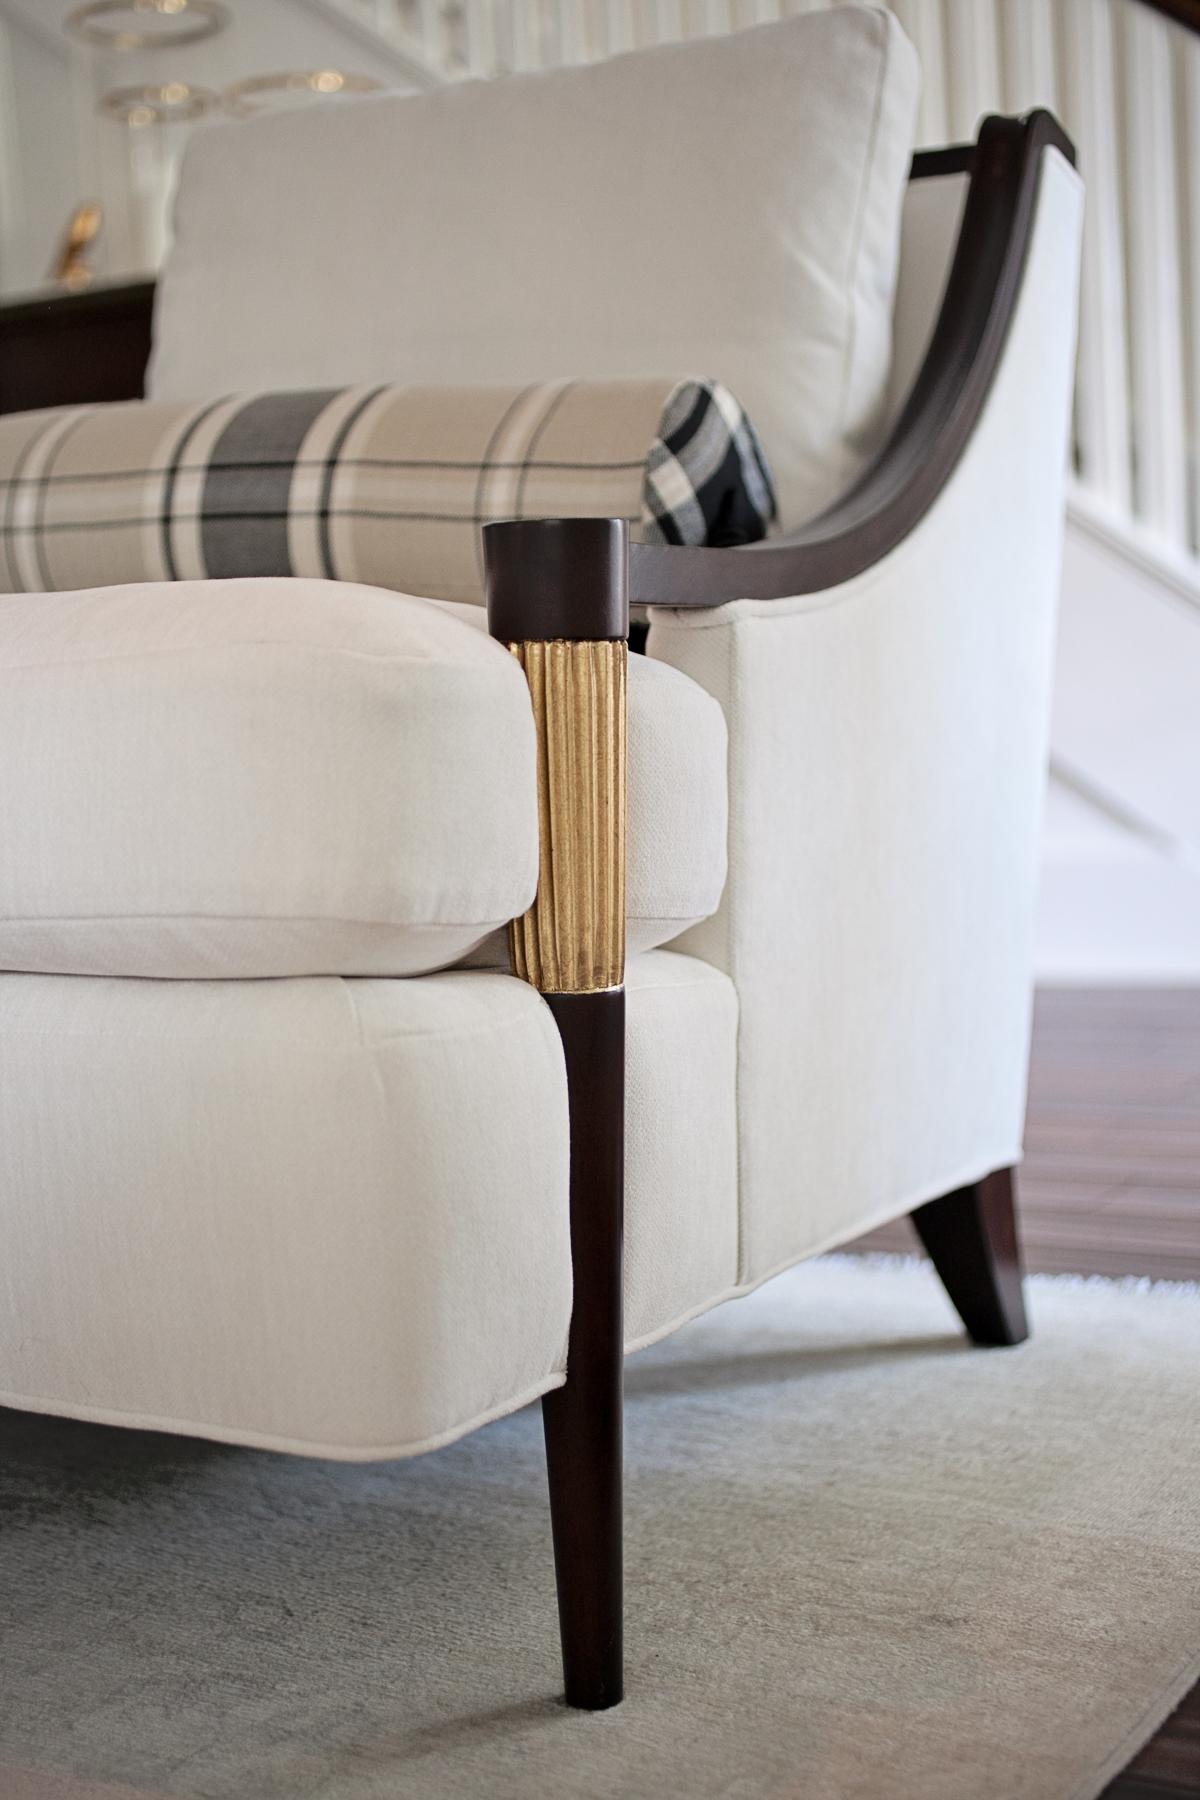 historic_interiordesign_lisagilmoredesign3